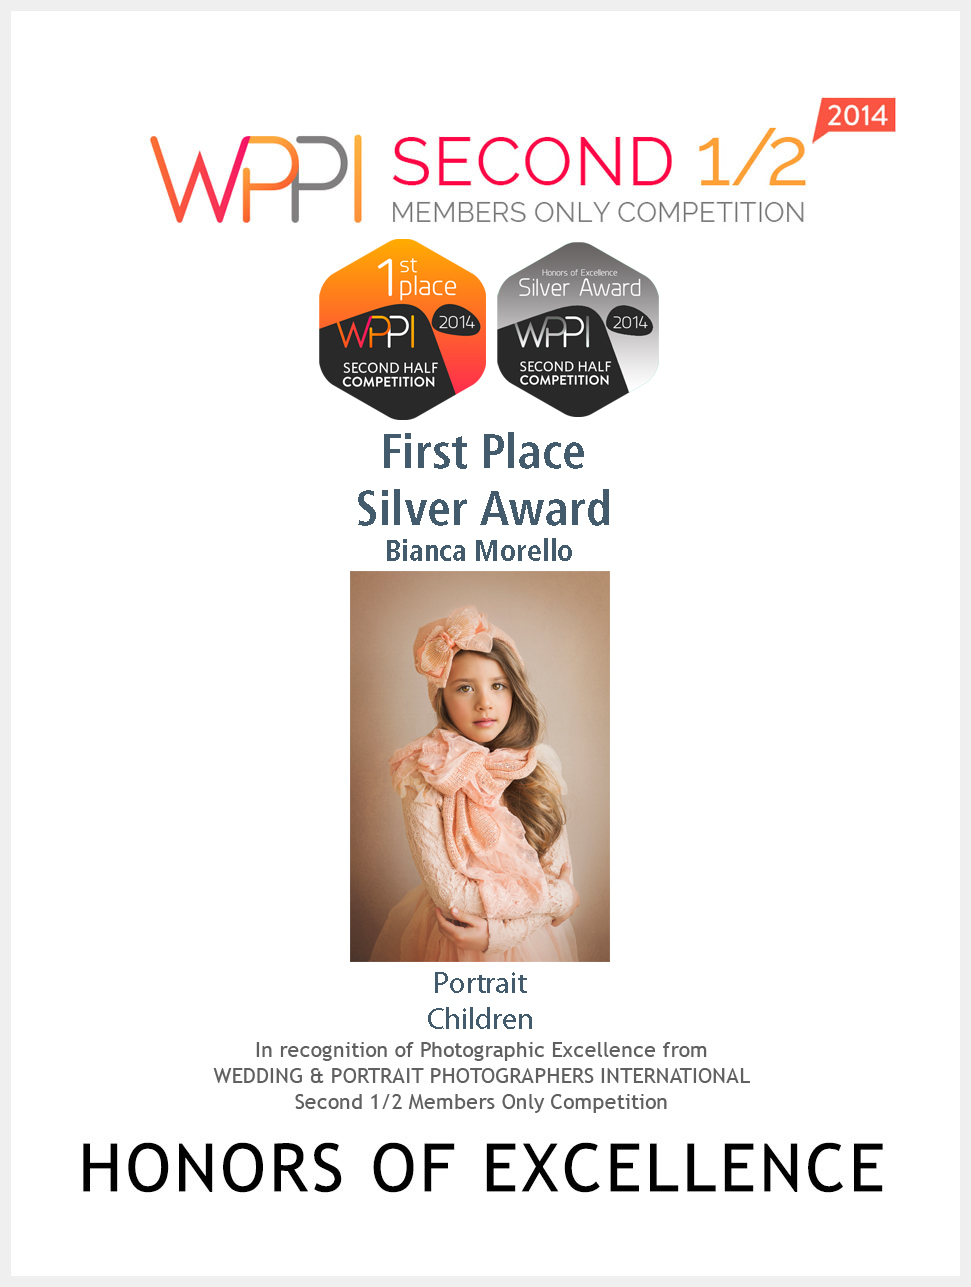 WPPIawards_2014SecondHalf.jpg